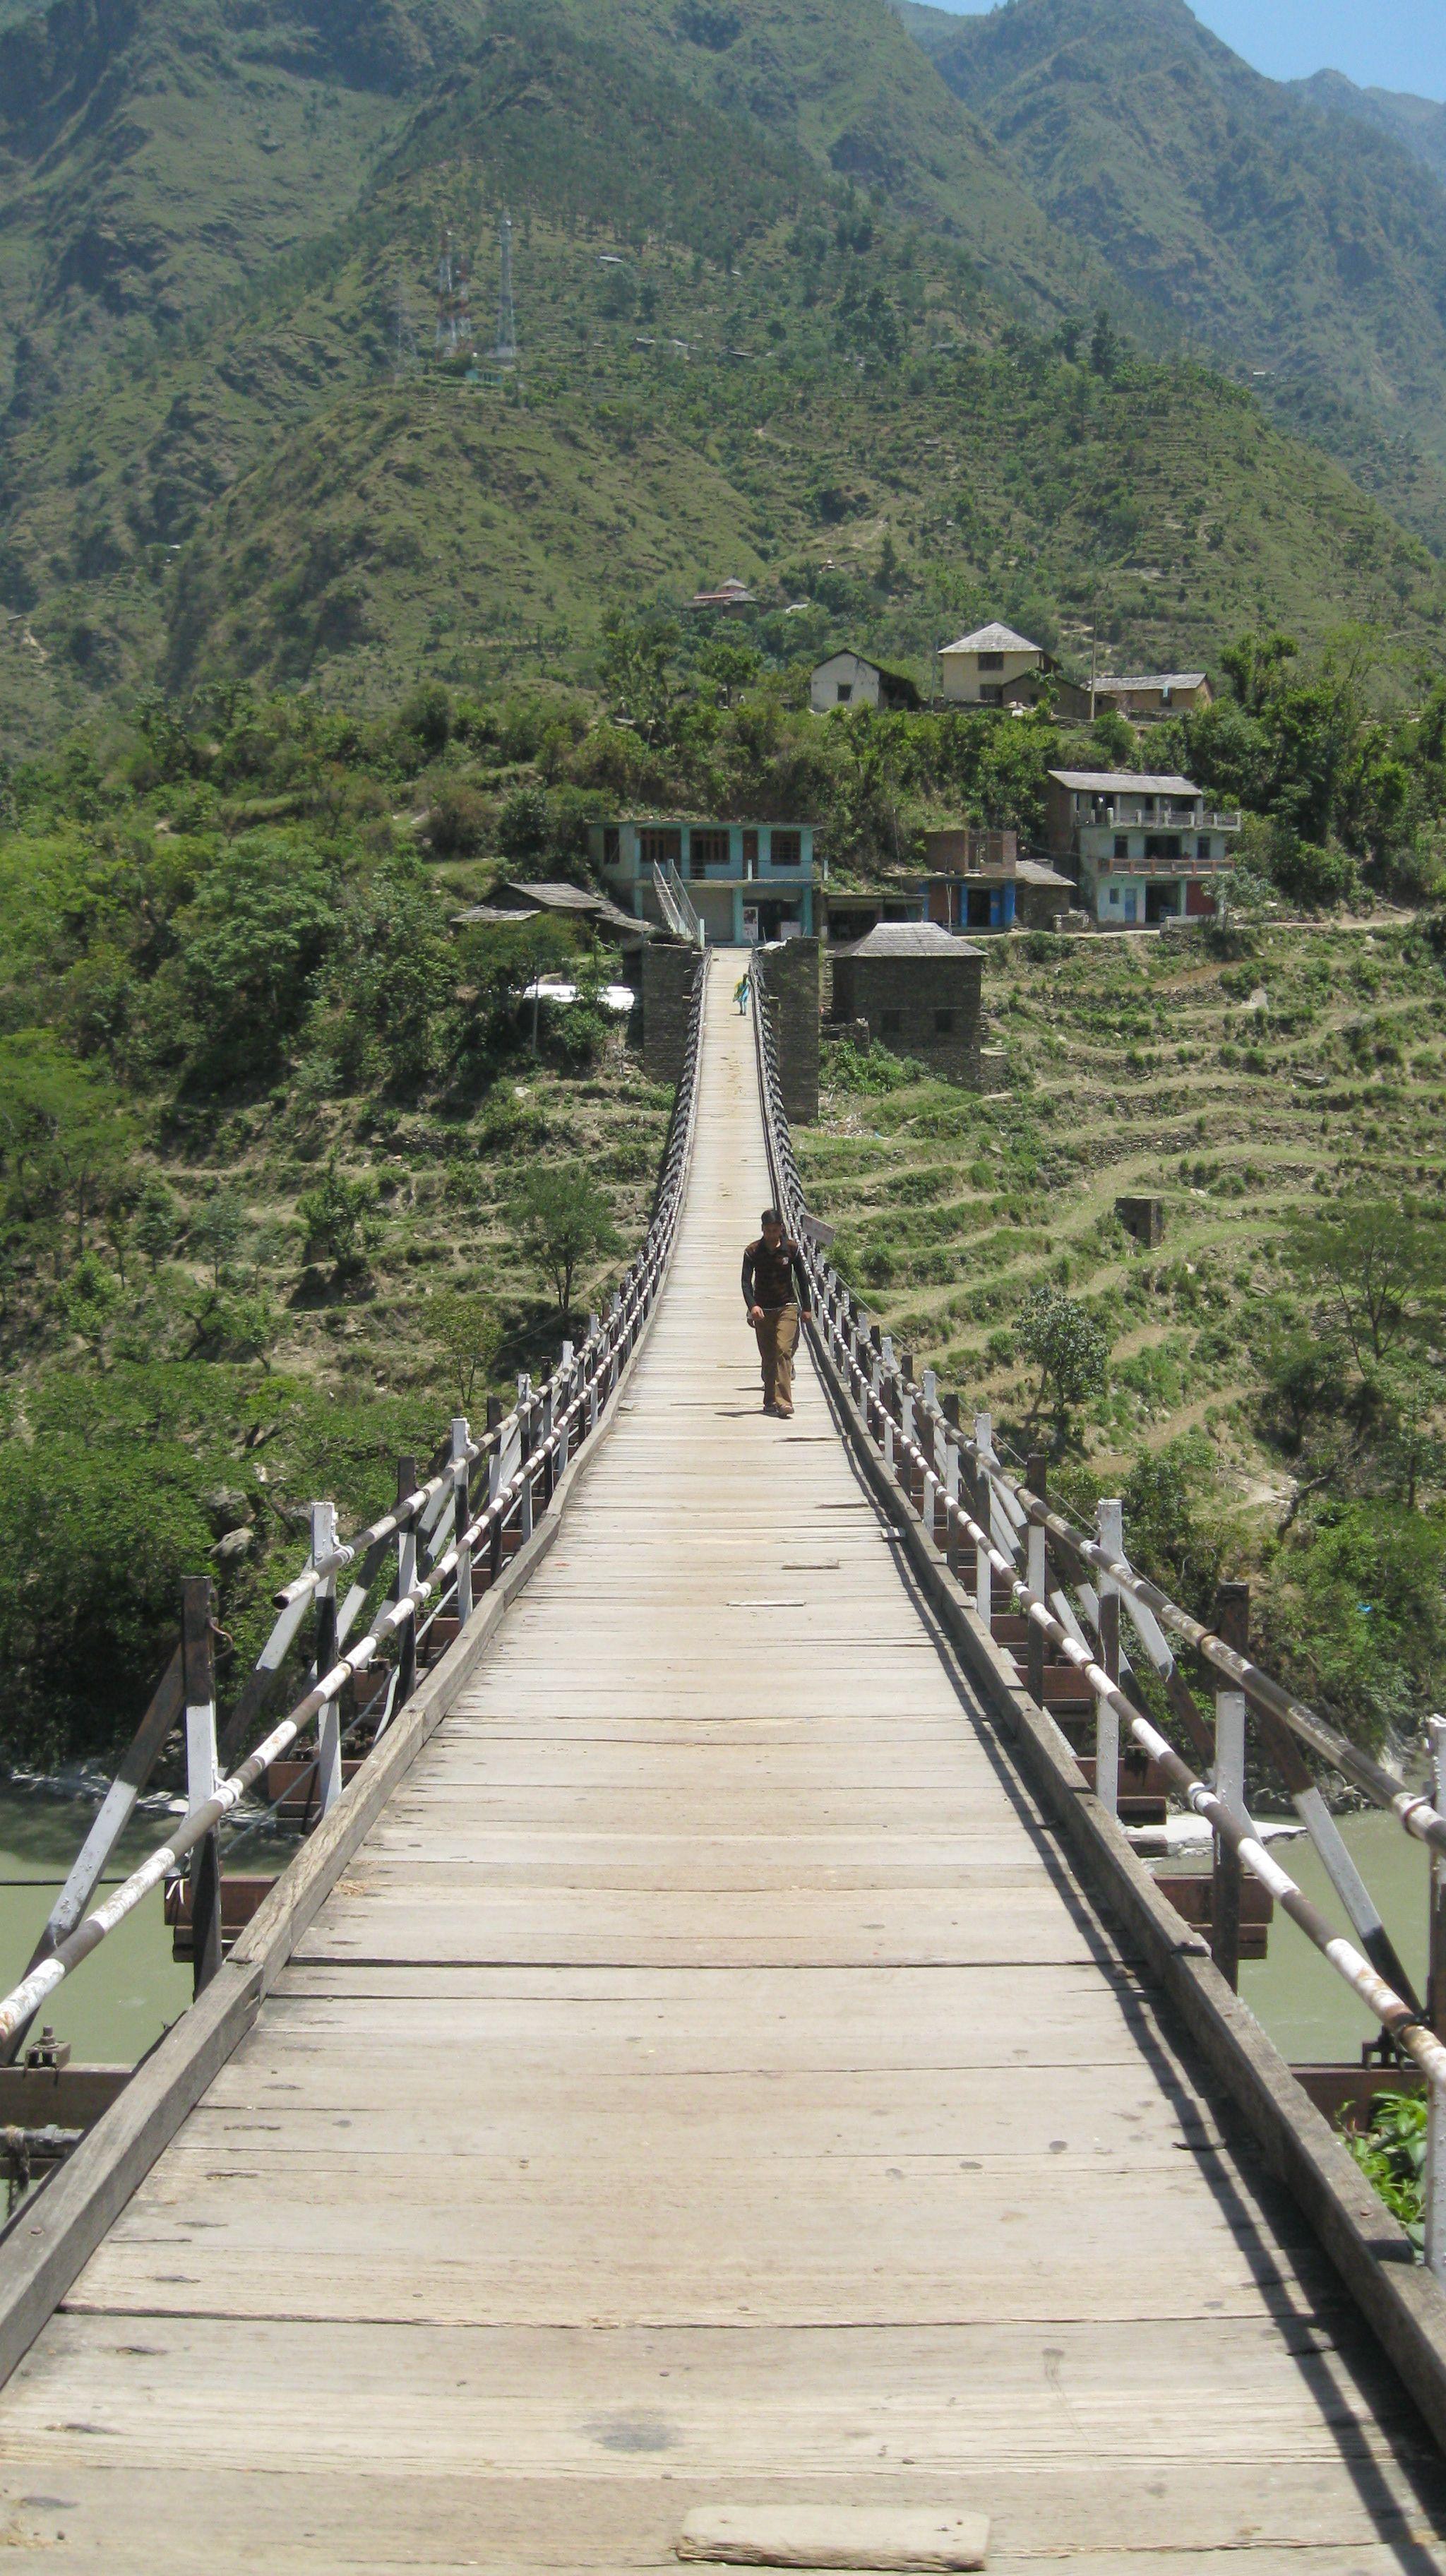 The Photo Of A Bridge Adjoining 2 Mountains At Manali India